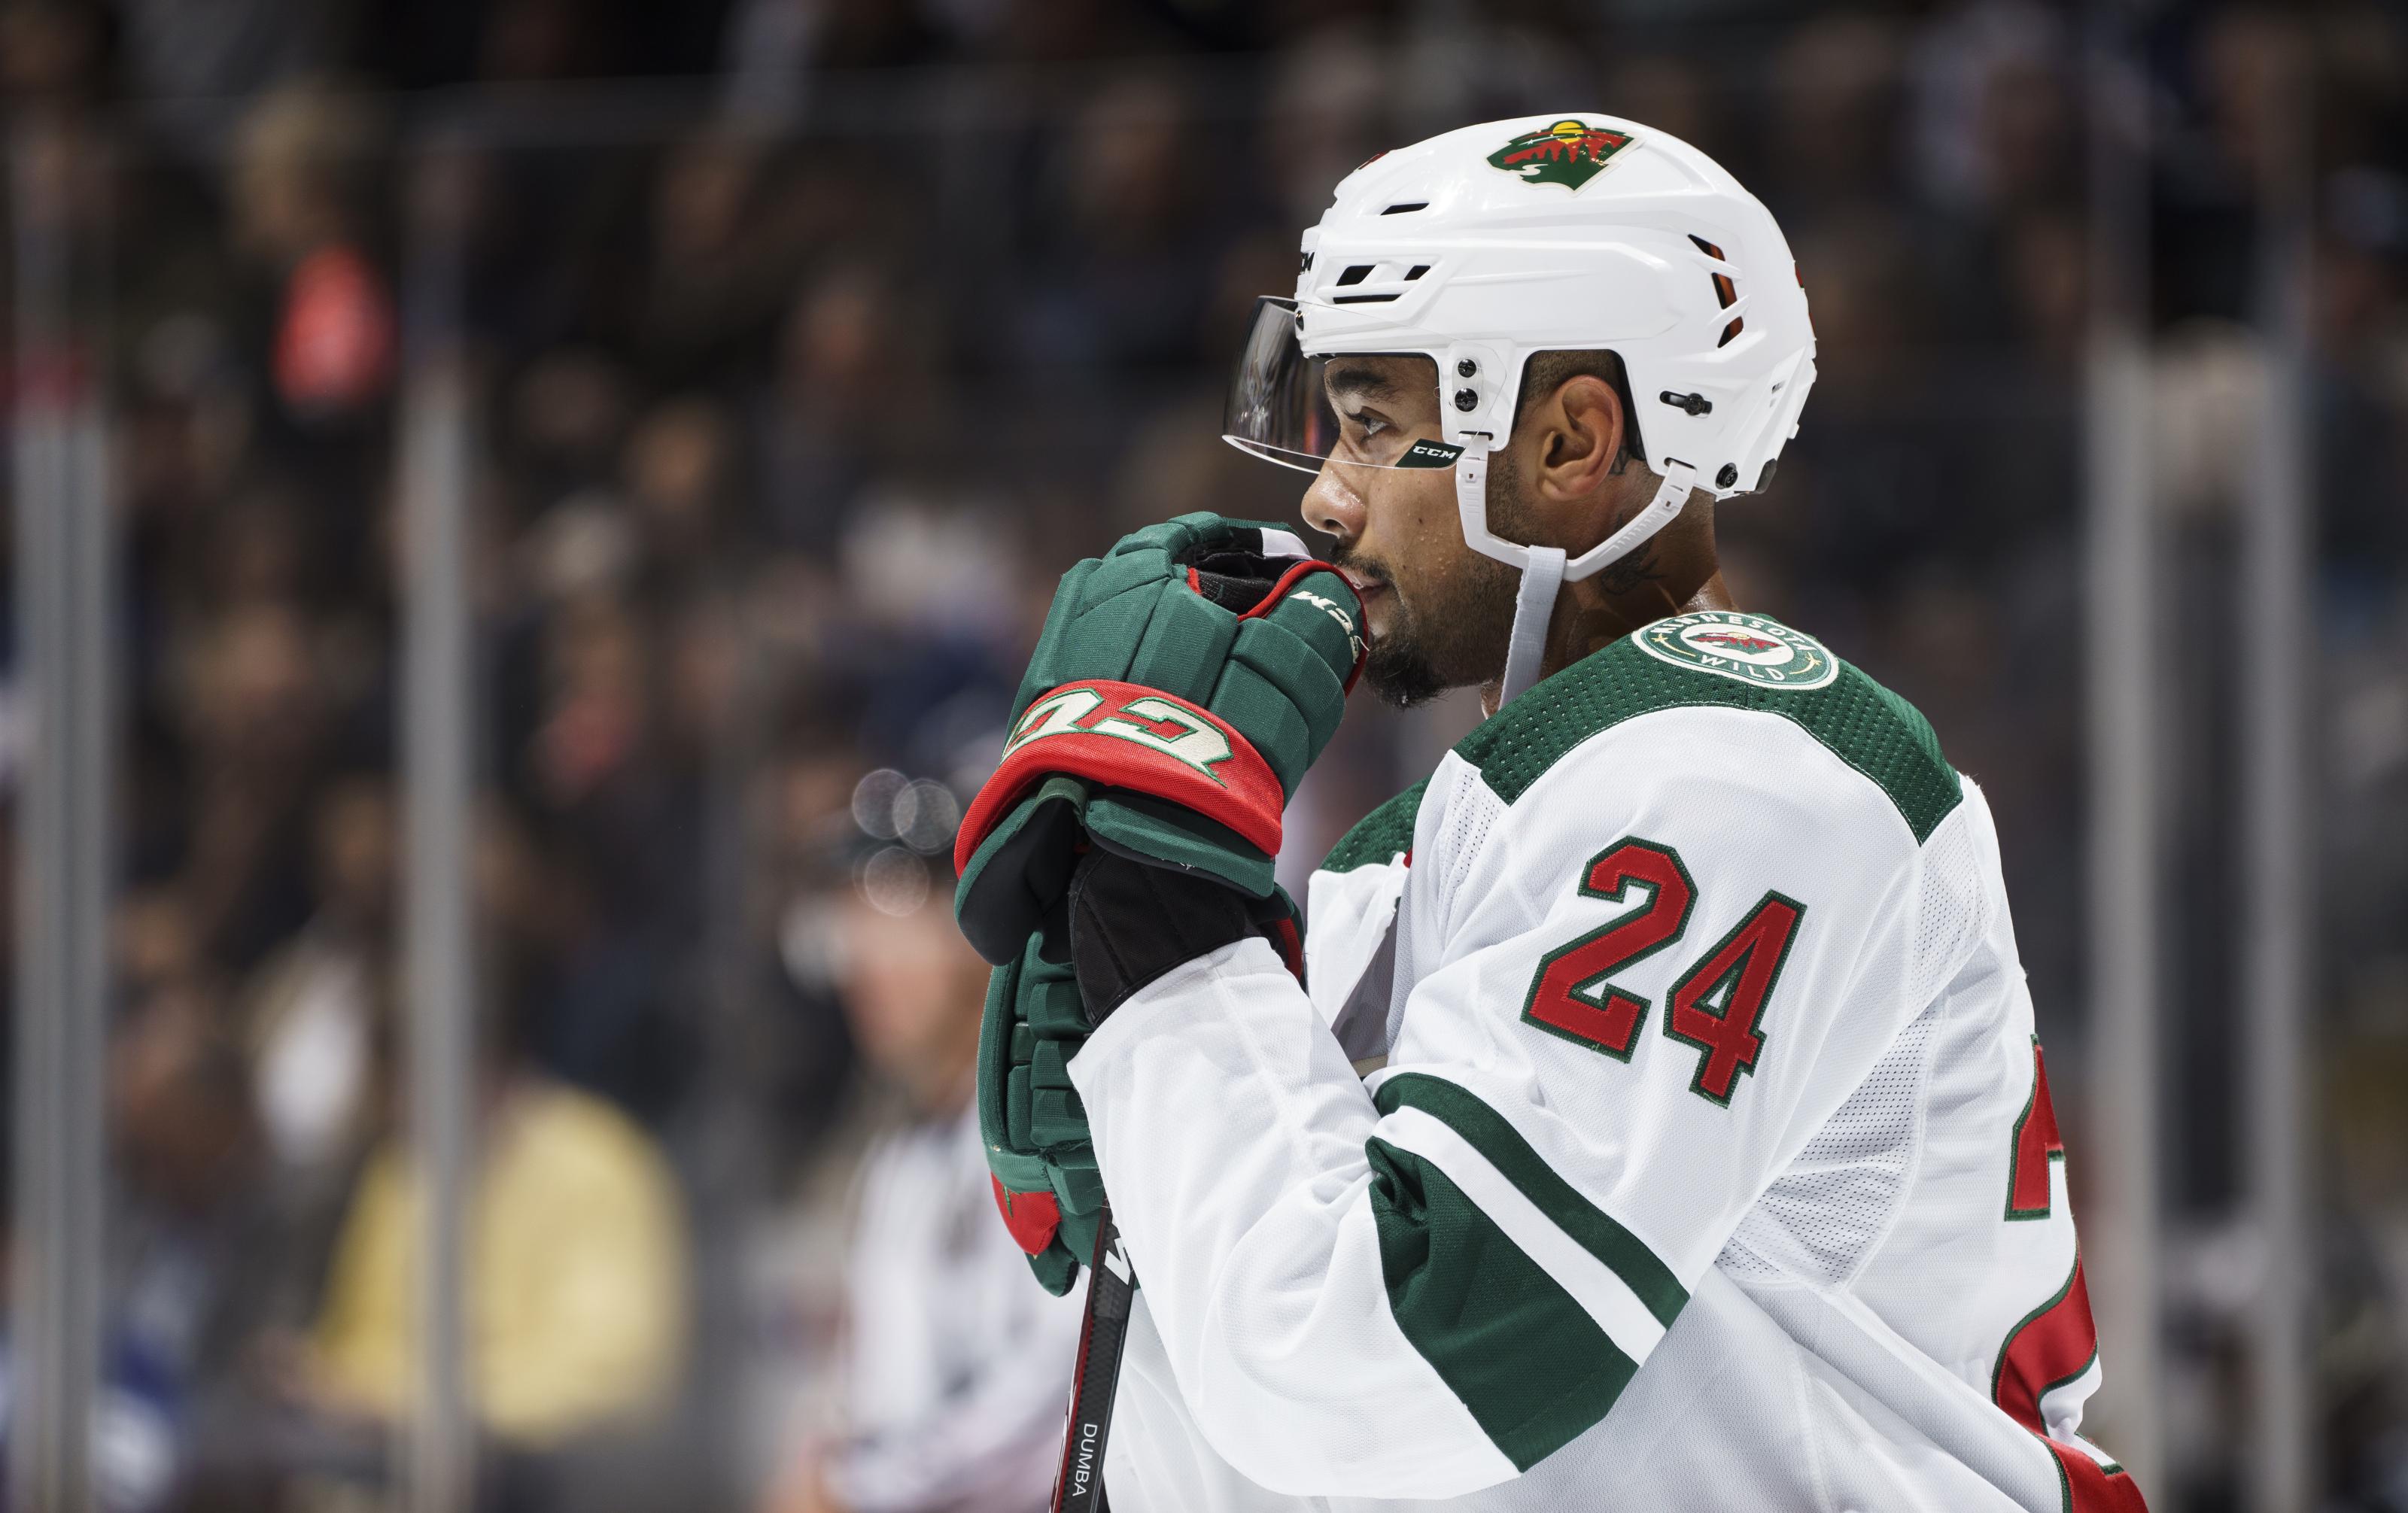 Nhl Trade Rumors Toronto Maple Leafs Pursuing Matt Dumba